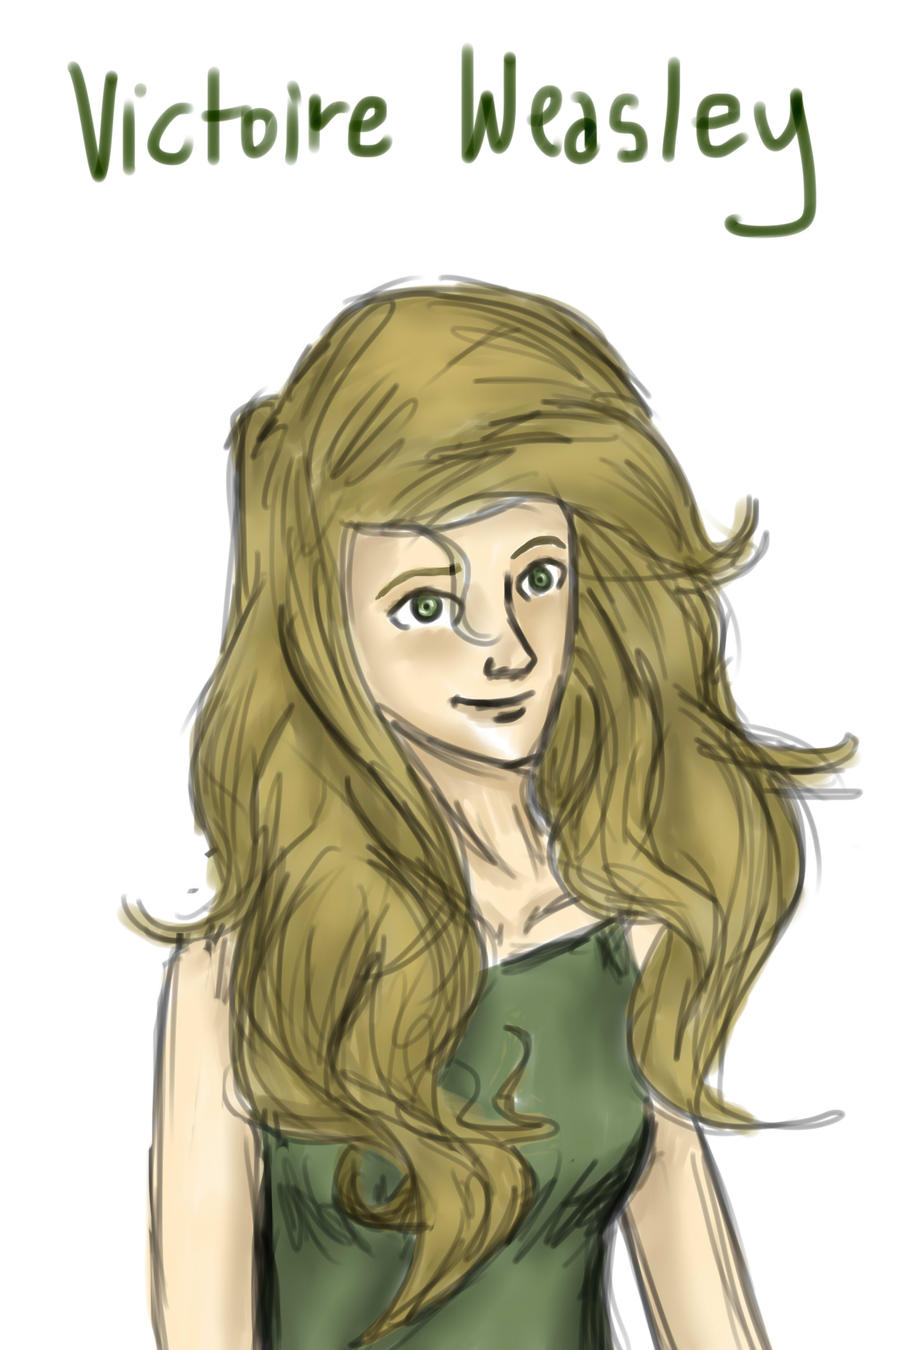 Victoire Weasley by CloudedInfluence on deviantART